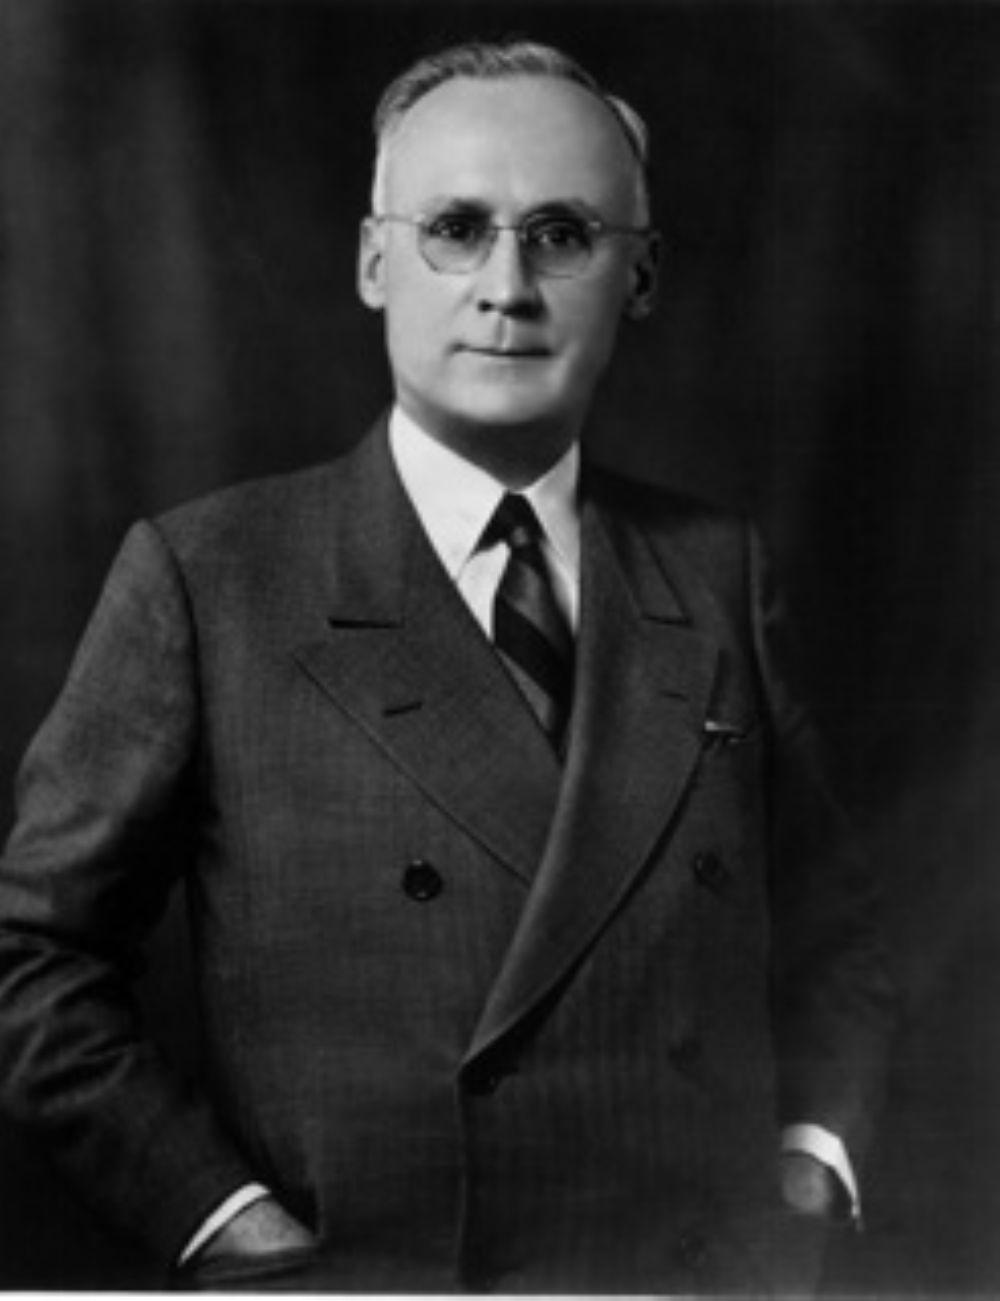 William H. Ziegler, founder and president of William H. Ziegler Co. Inc.